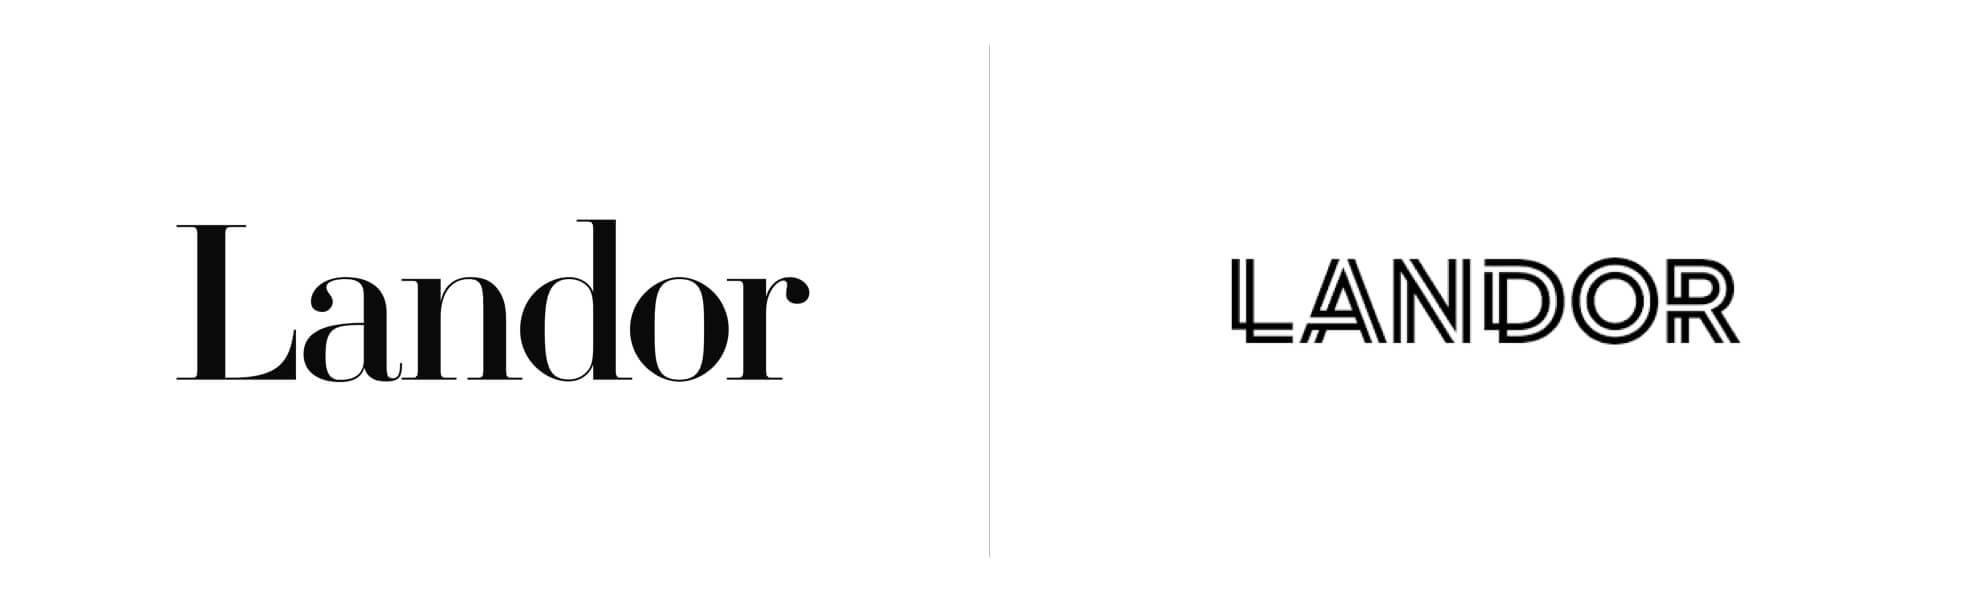 stare inowe logo landora